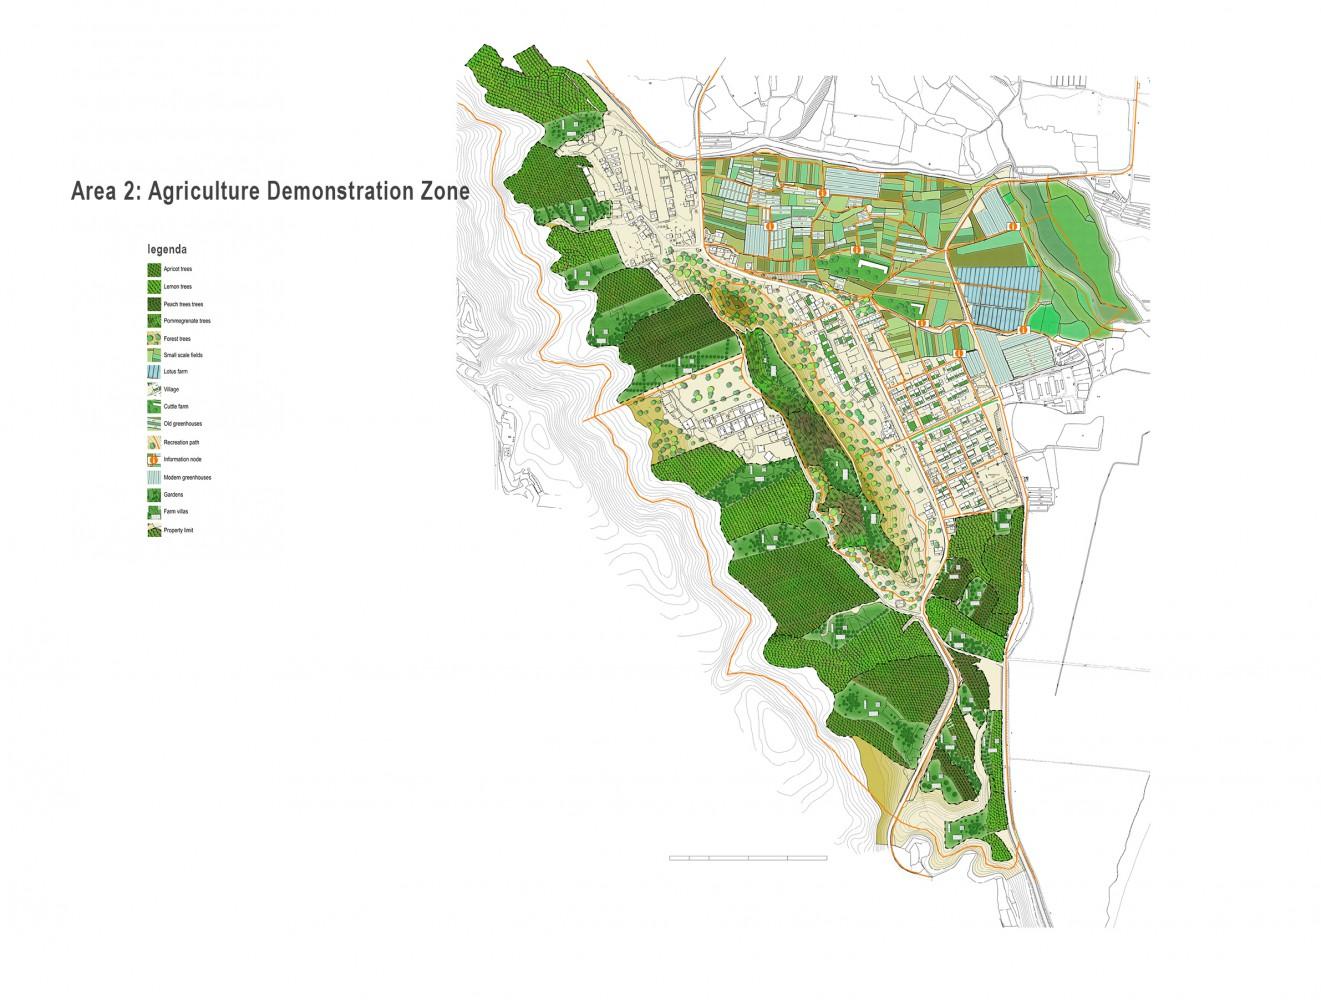 kaart area 2